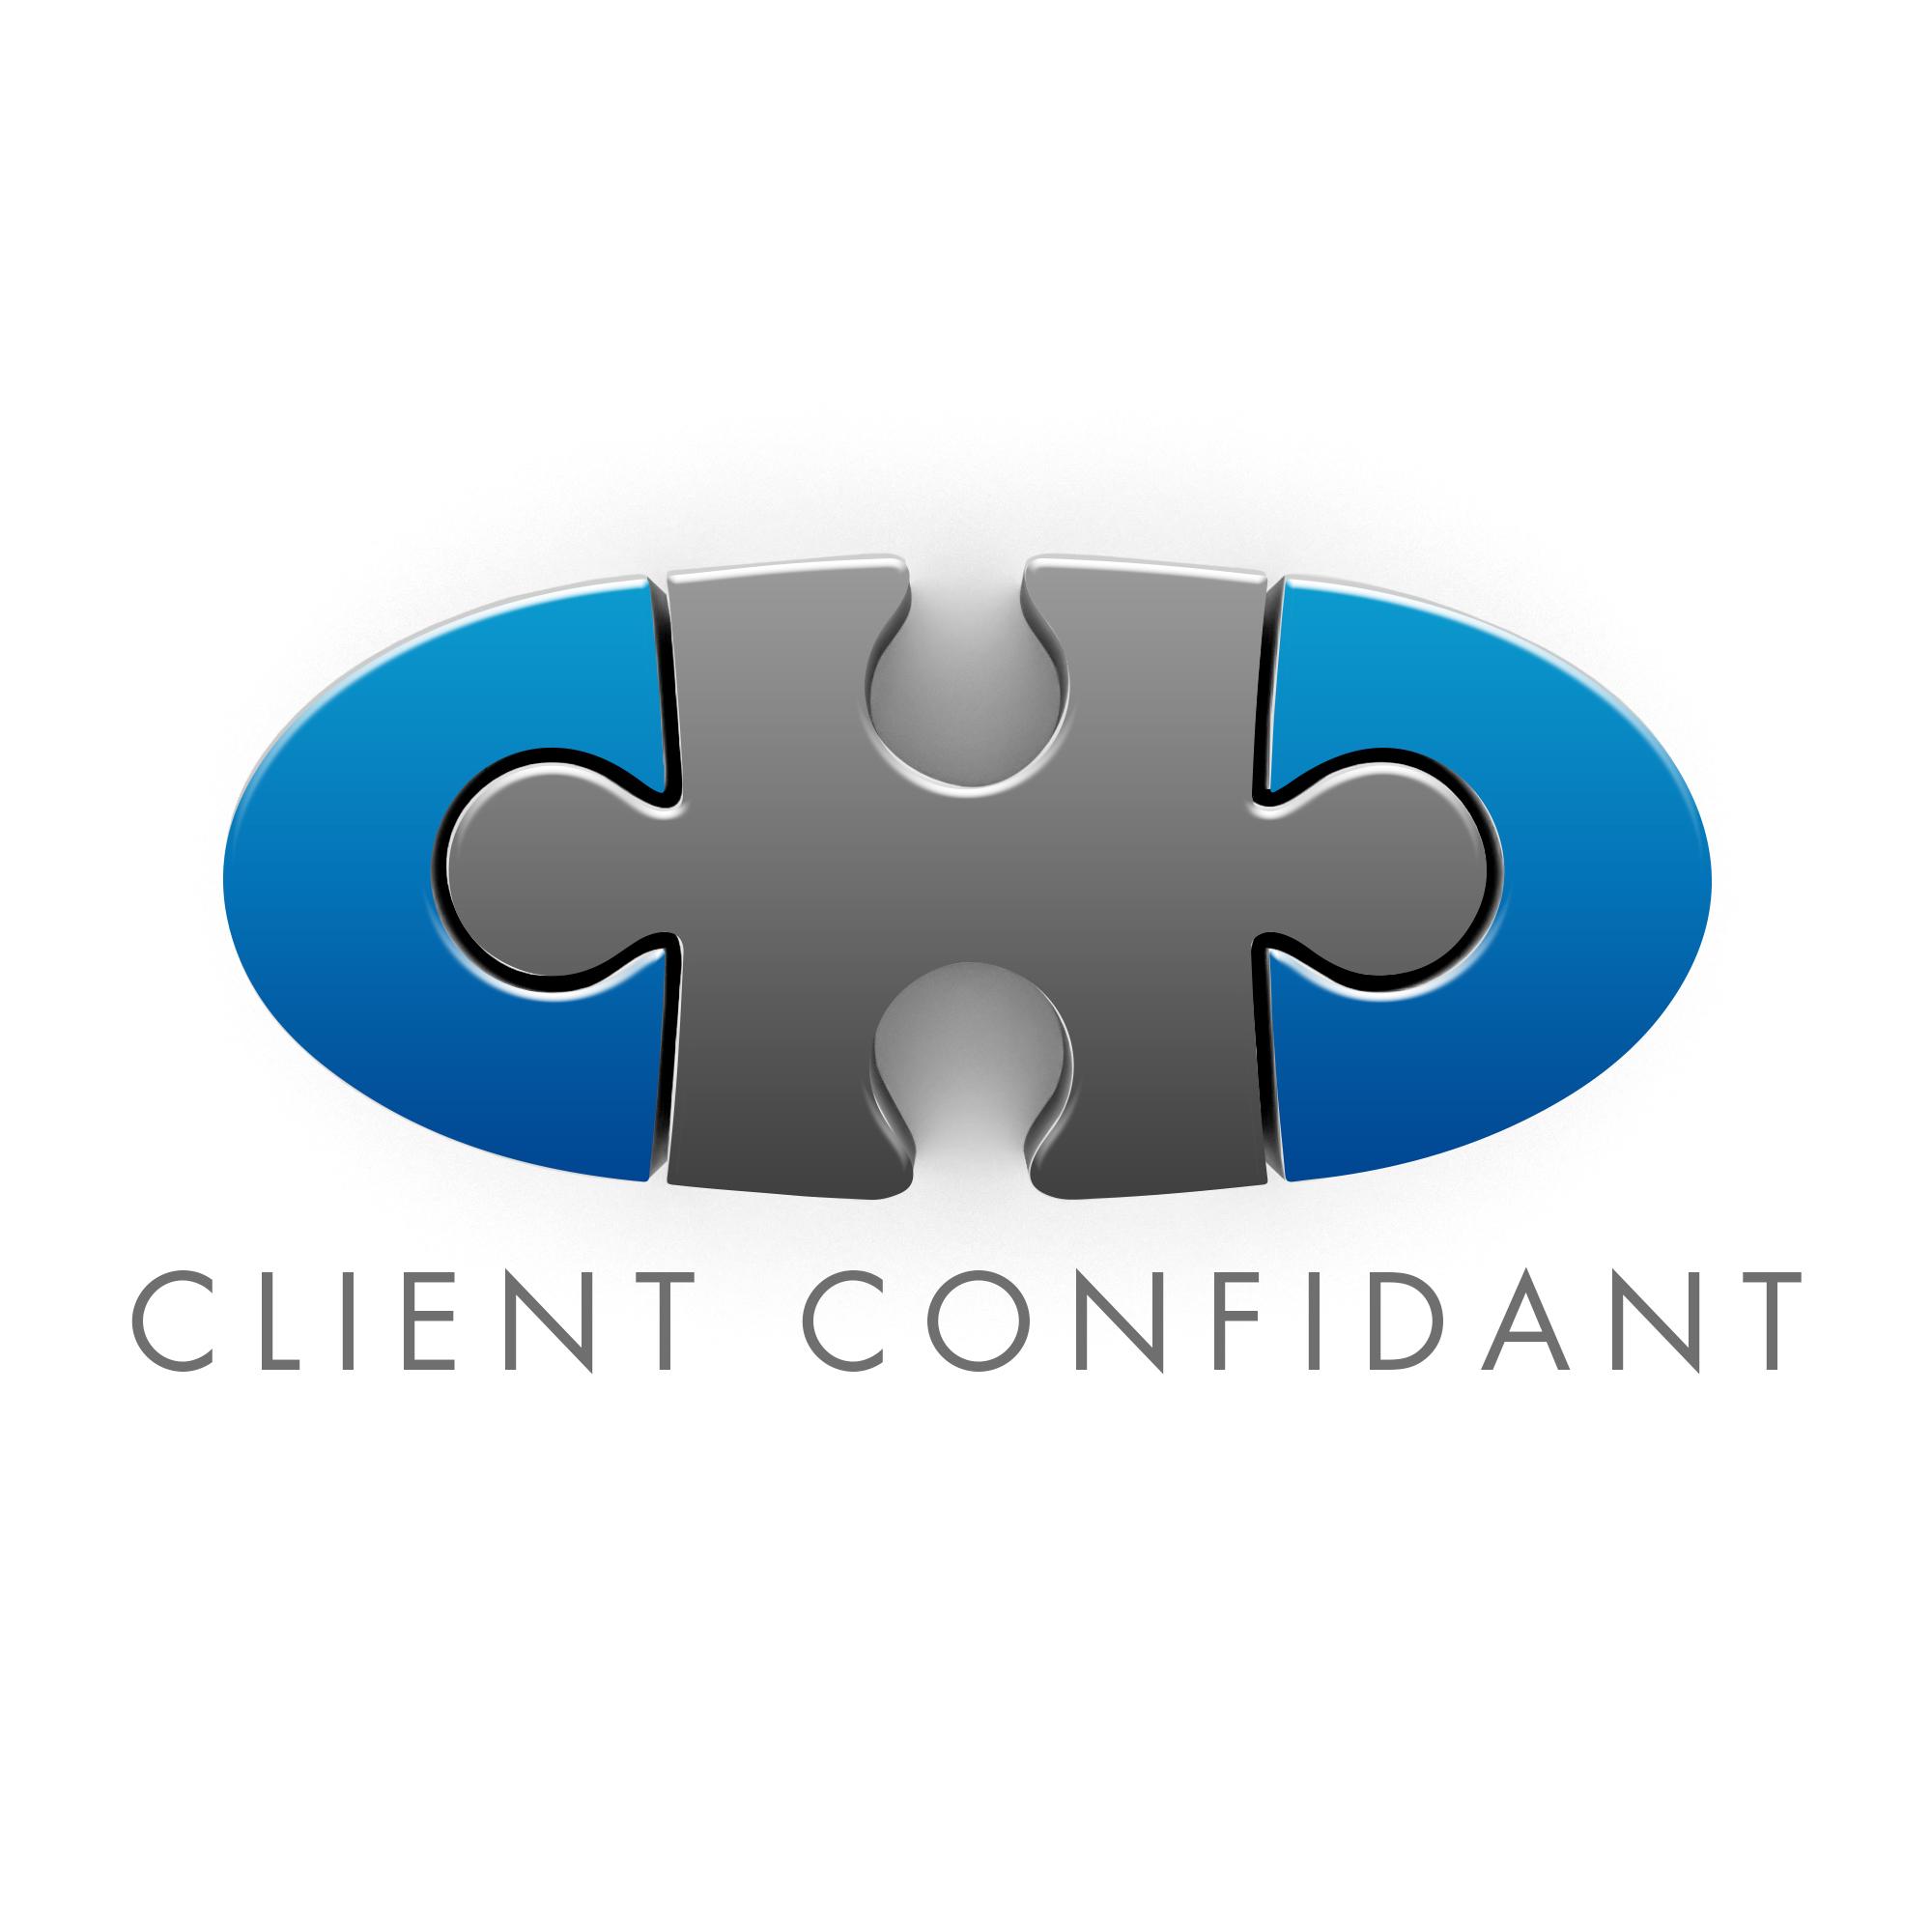 cc-logo-3d-300.jpg